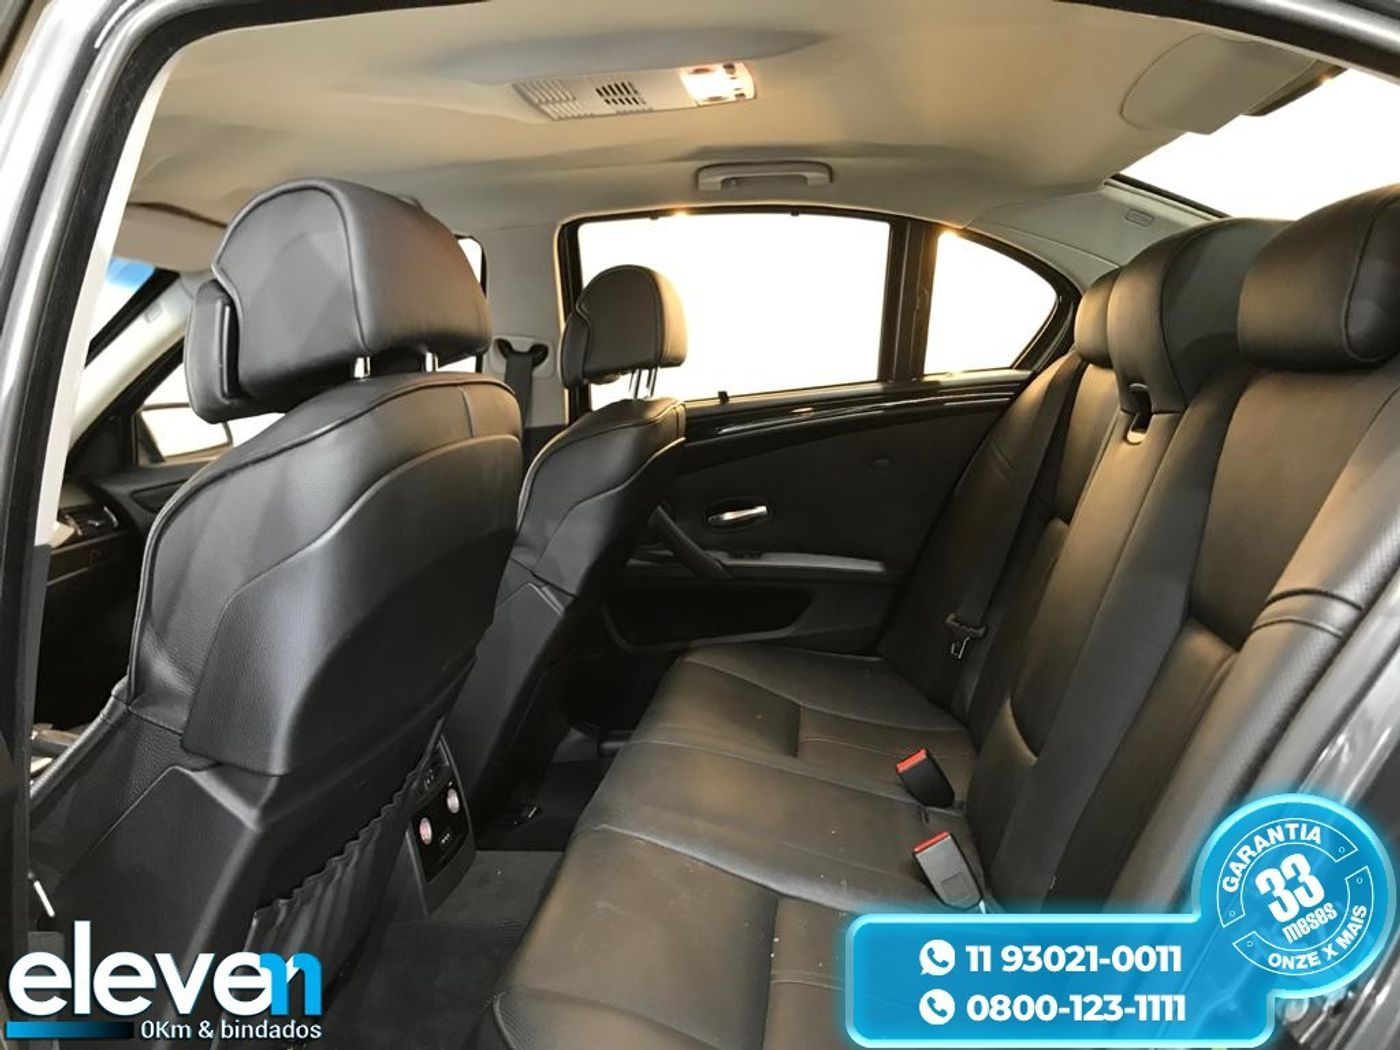 BMW 550iA Security 4.8 32V